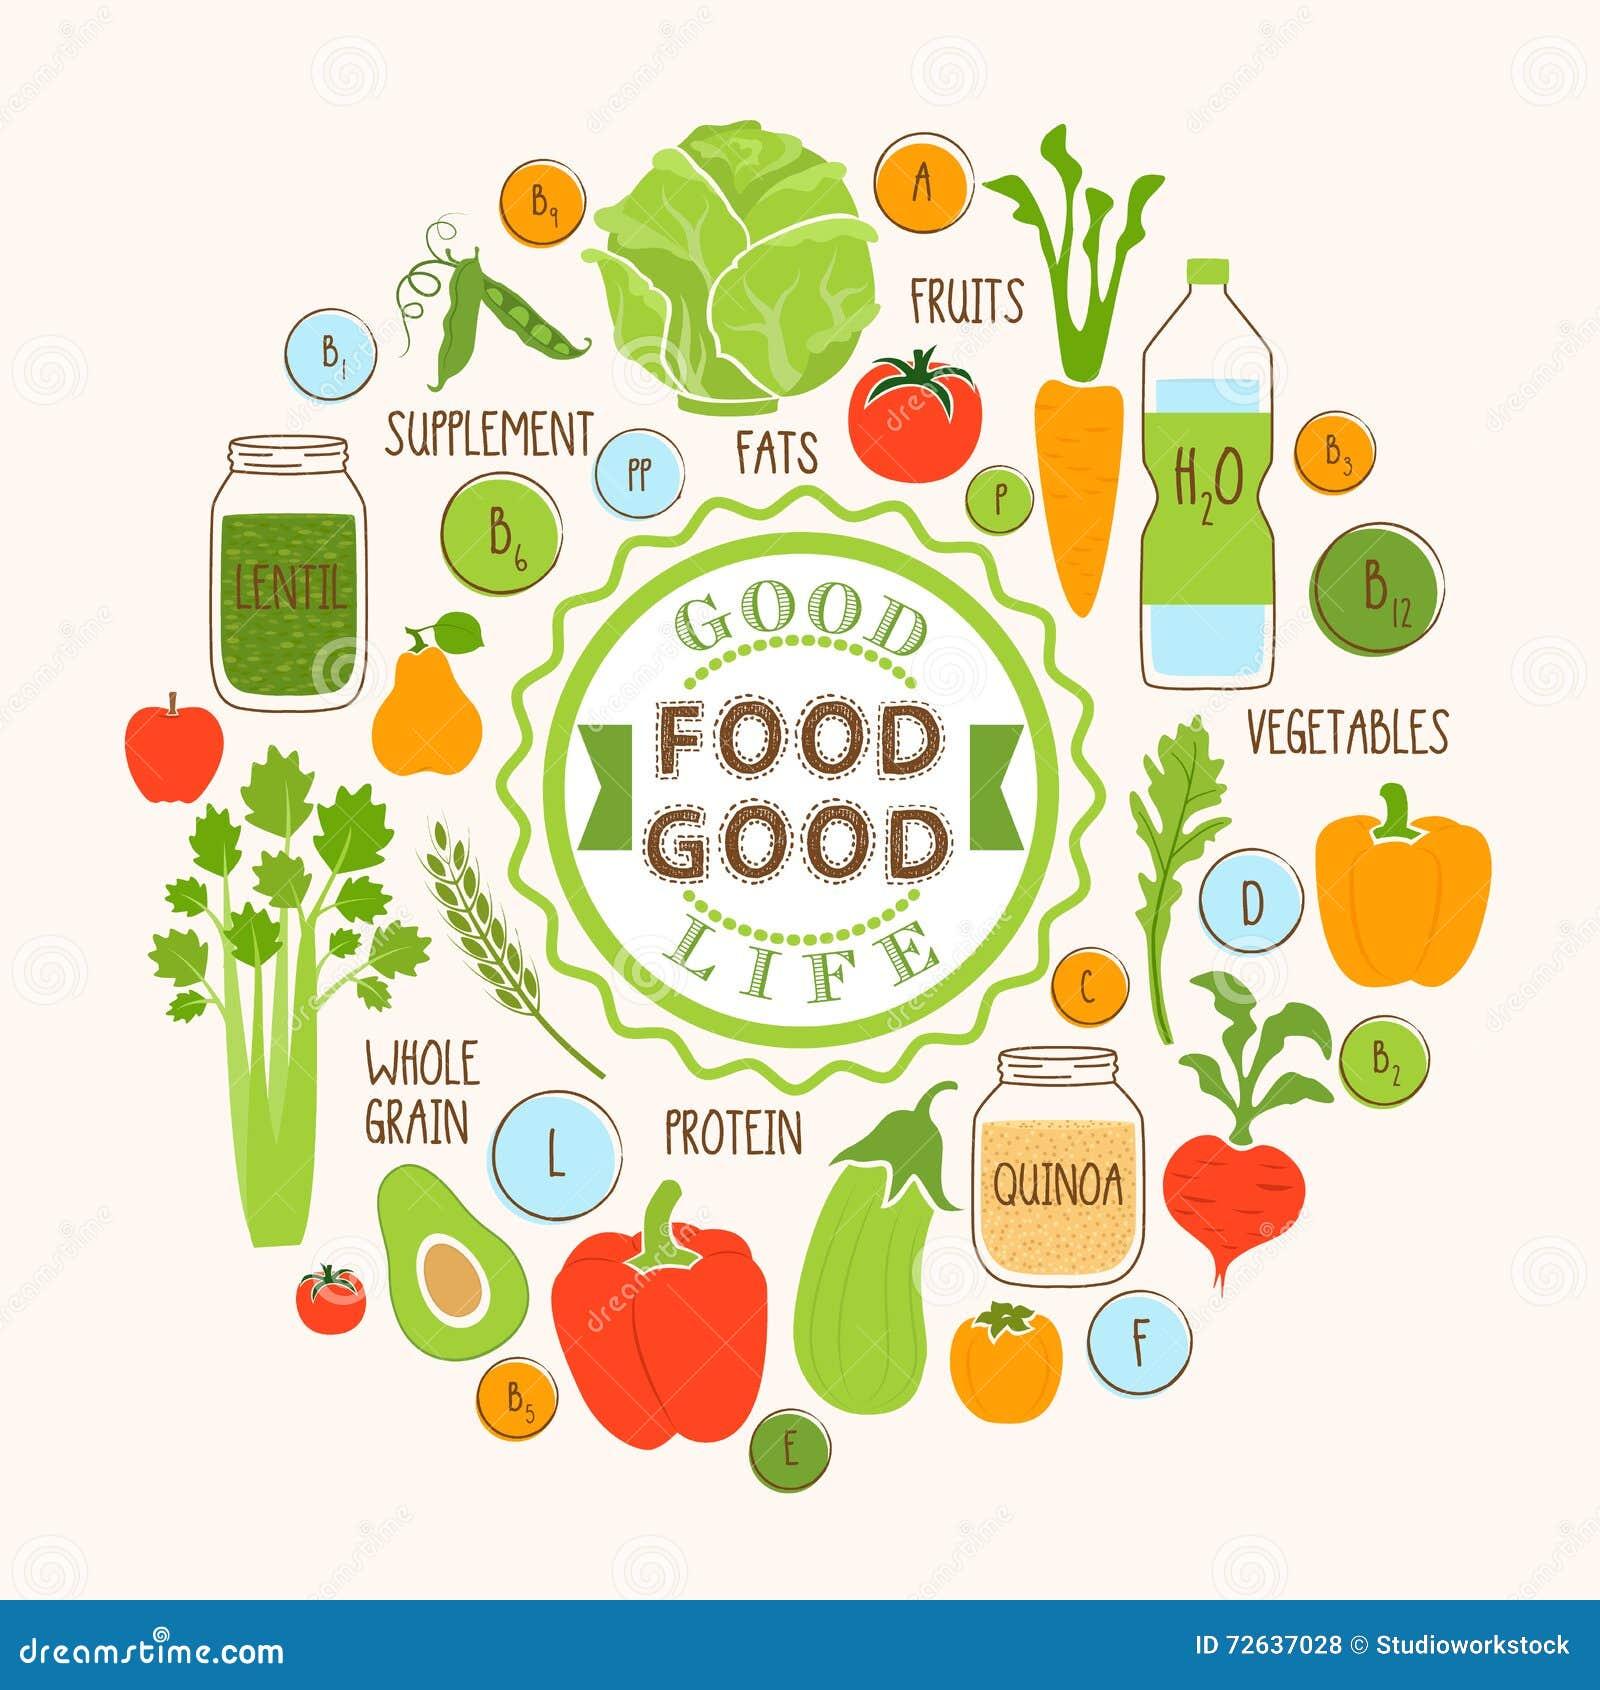 Summer Foods To Make